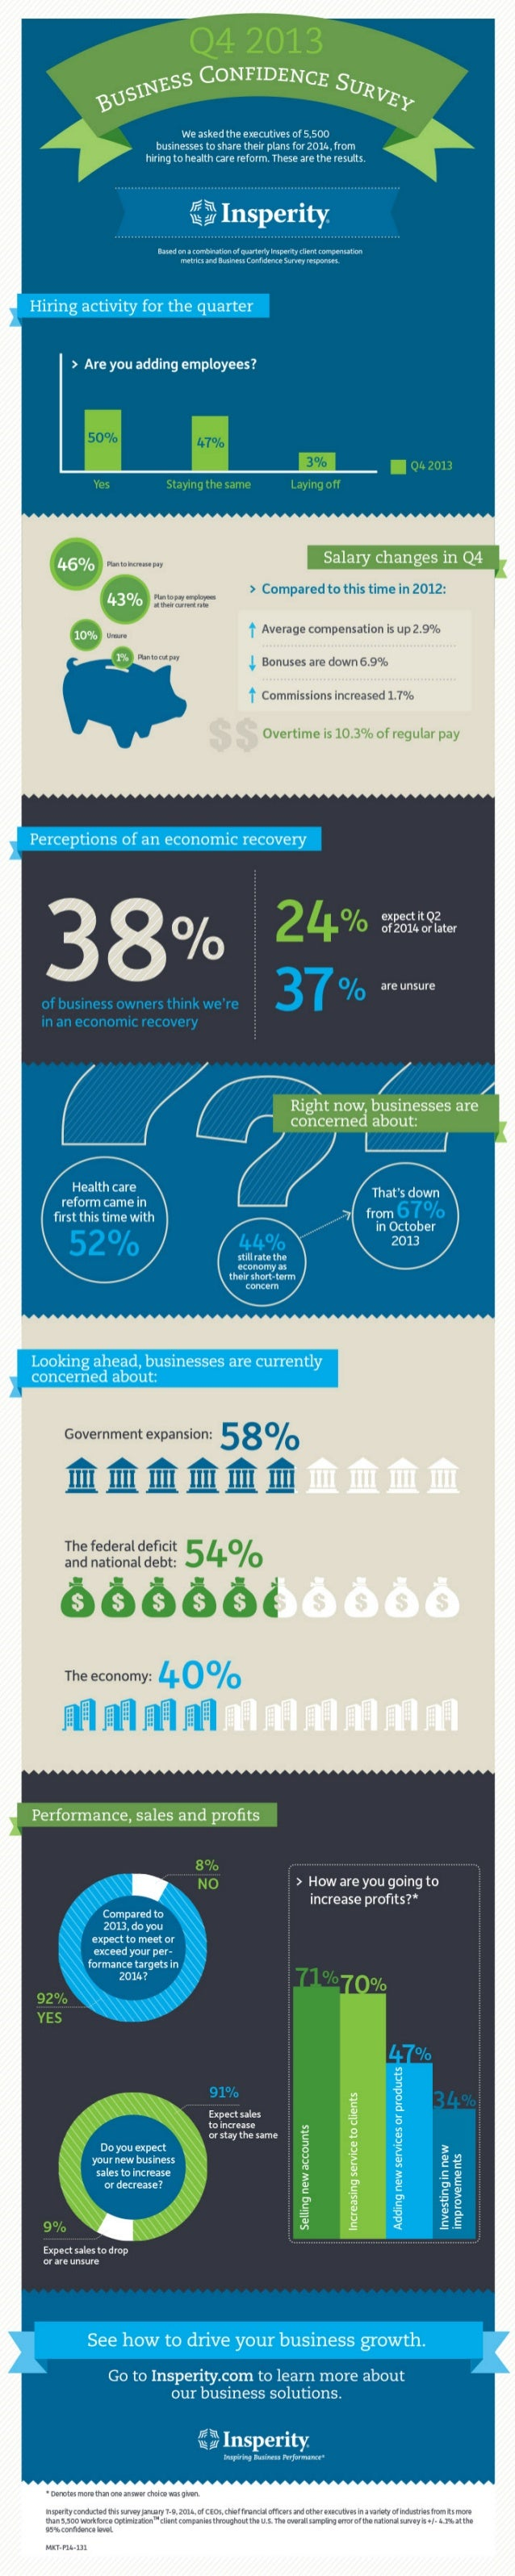 Insperity Business Confidence Survey: Q4 2013 [Infographic]